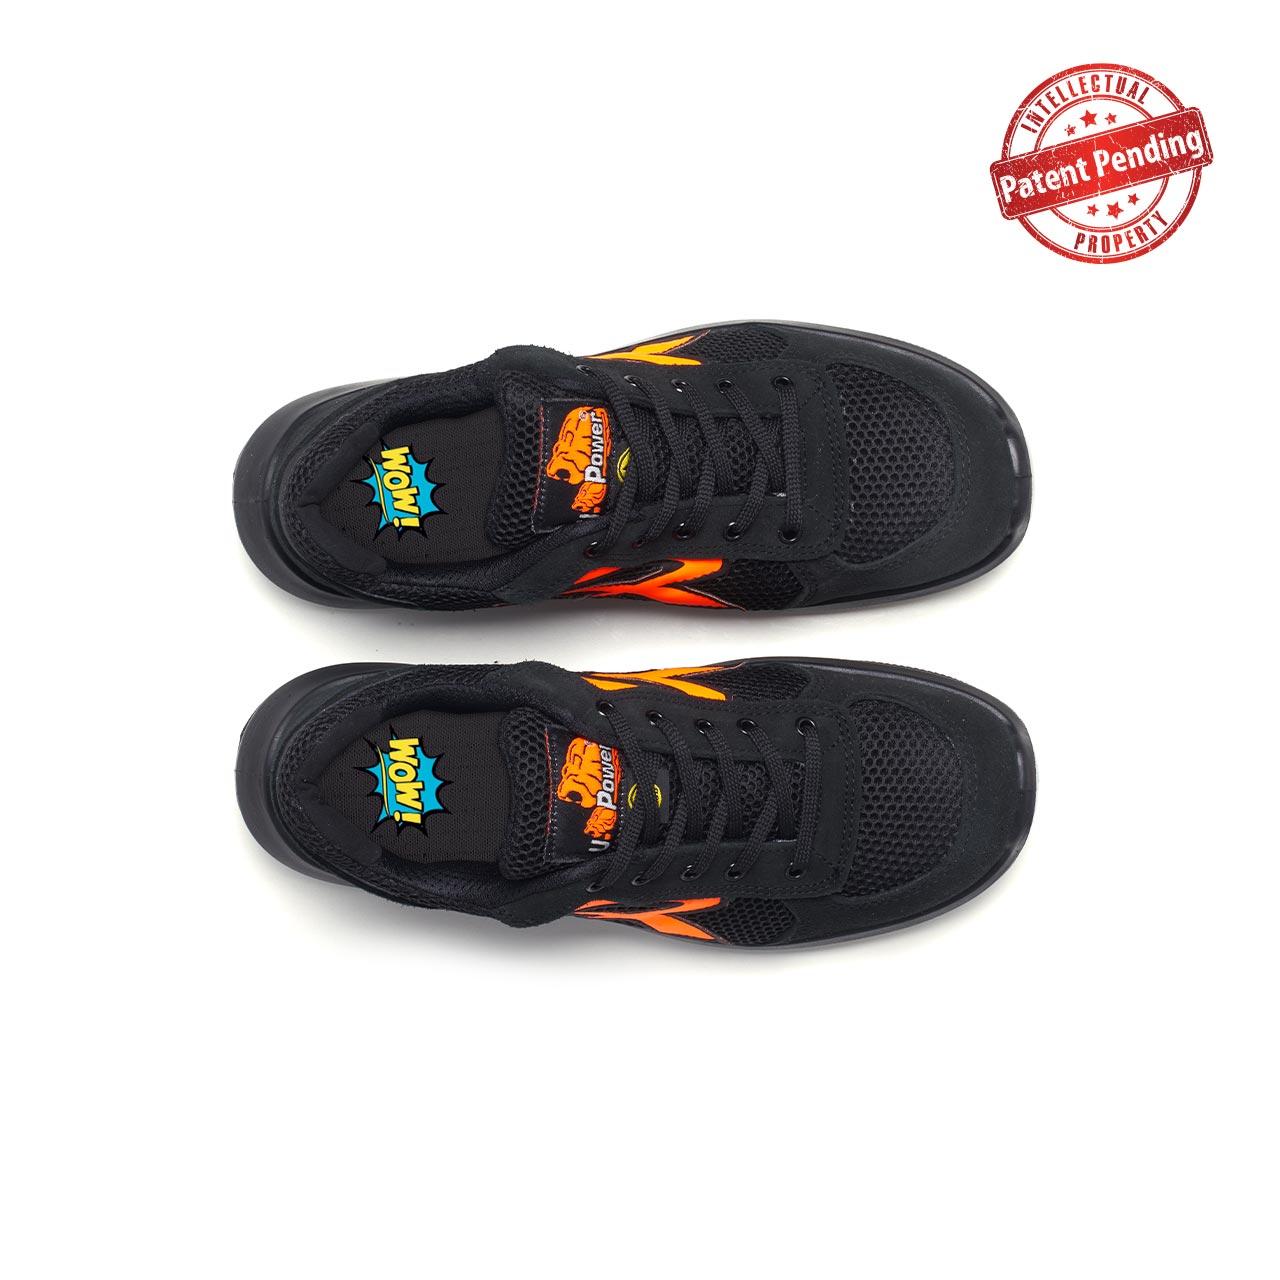 paio di scarpe antinfortunistiche upower modello atos linea redup vista top